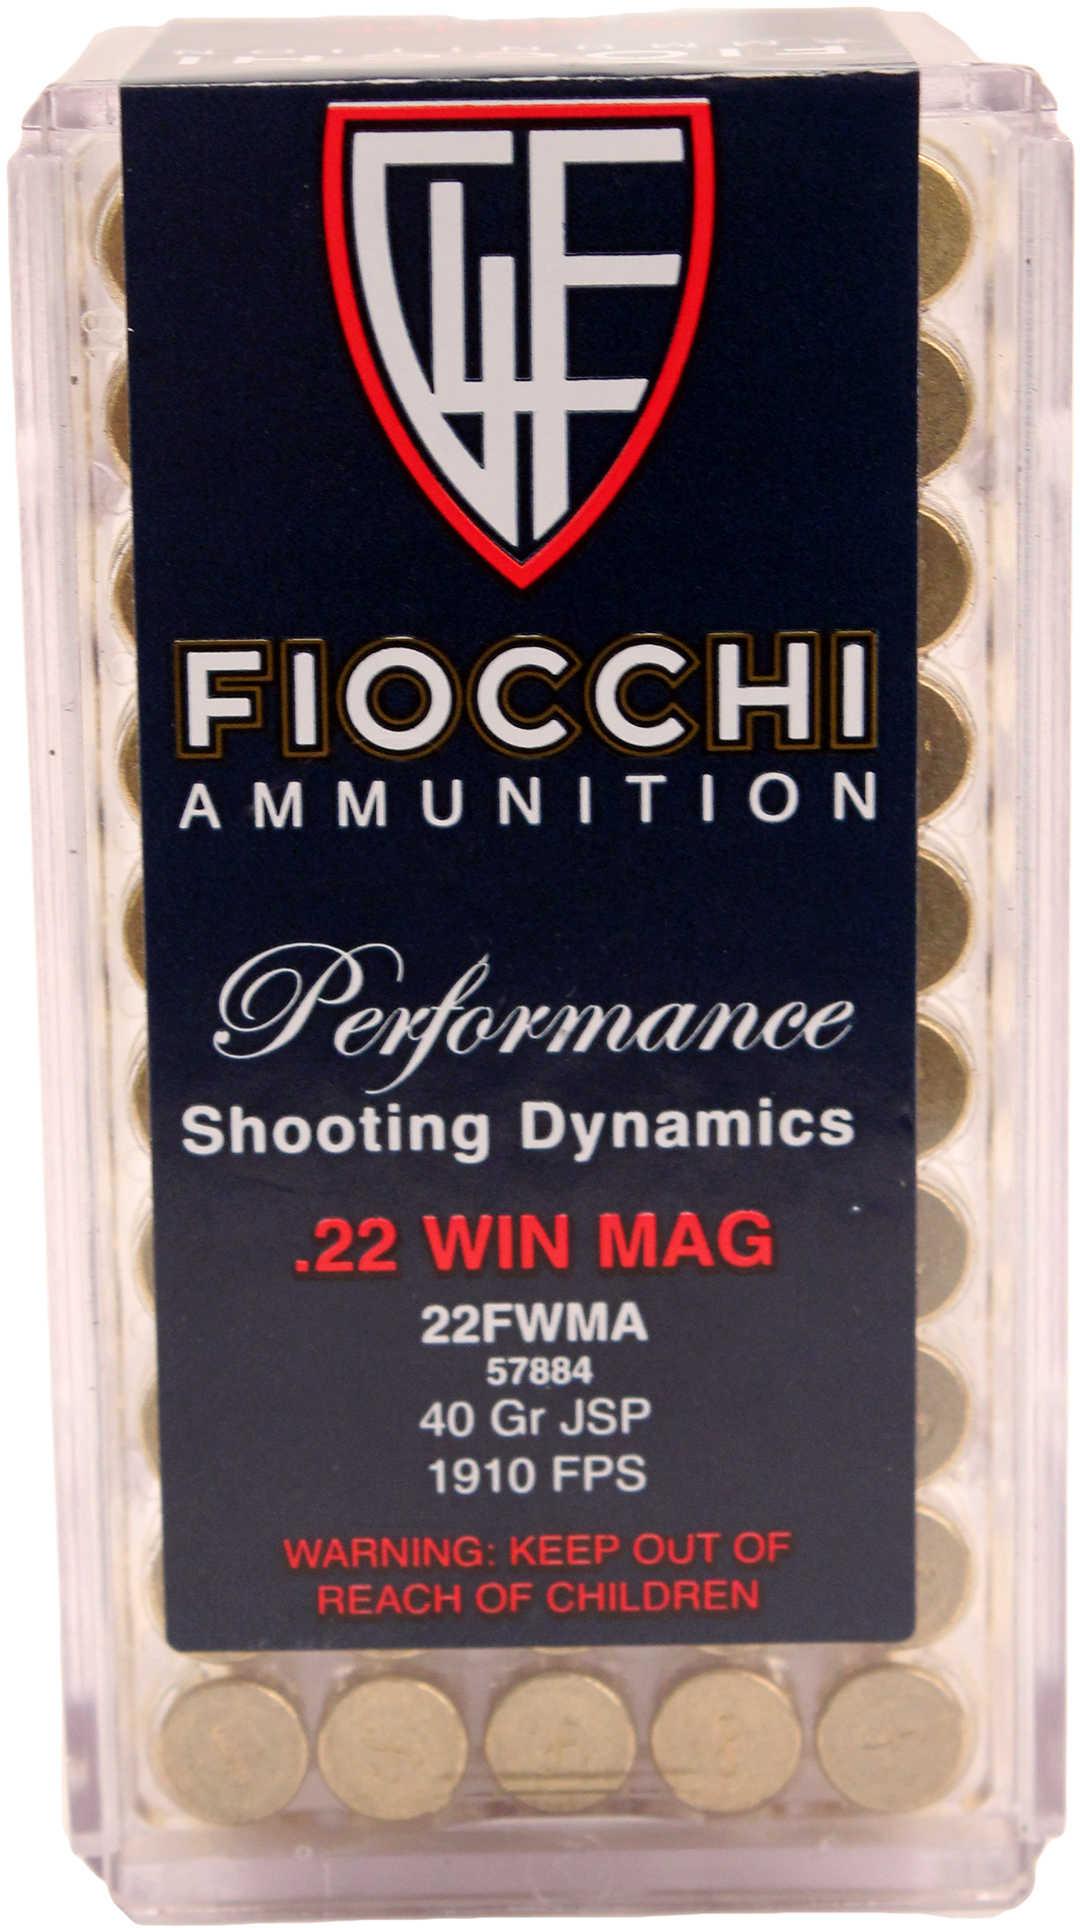 Fiocchi Ammunition Rimfire 22WMR 40 Grain Jacketed Soft Point 50 Round Box 22FWMA